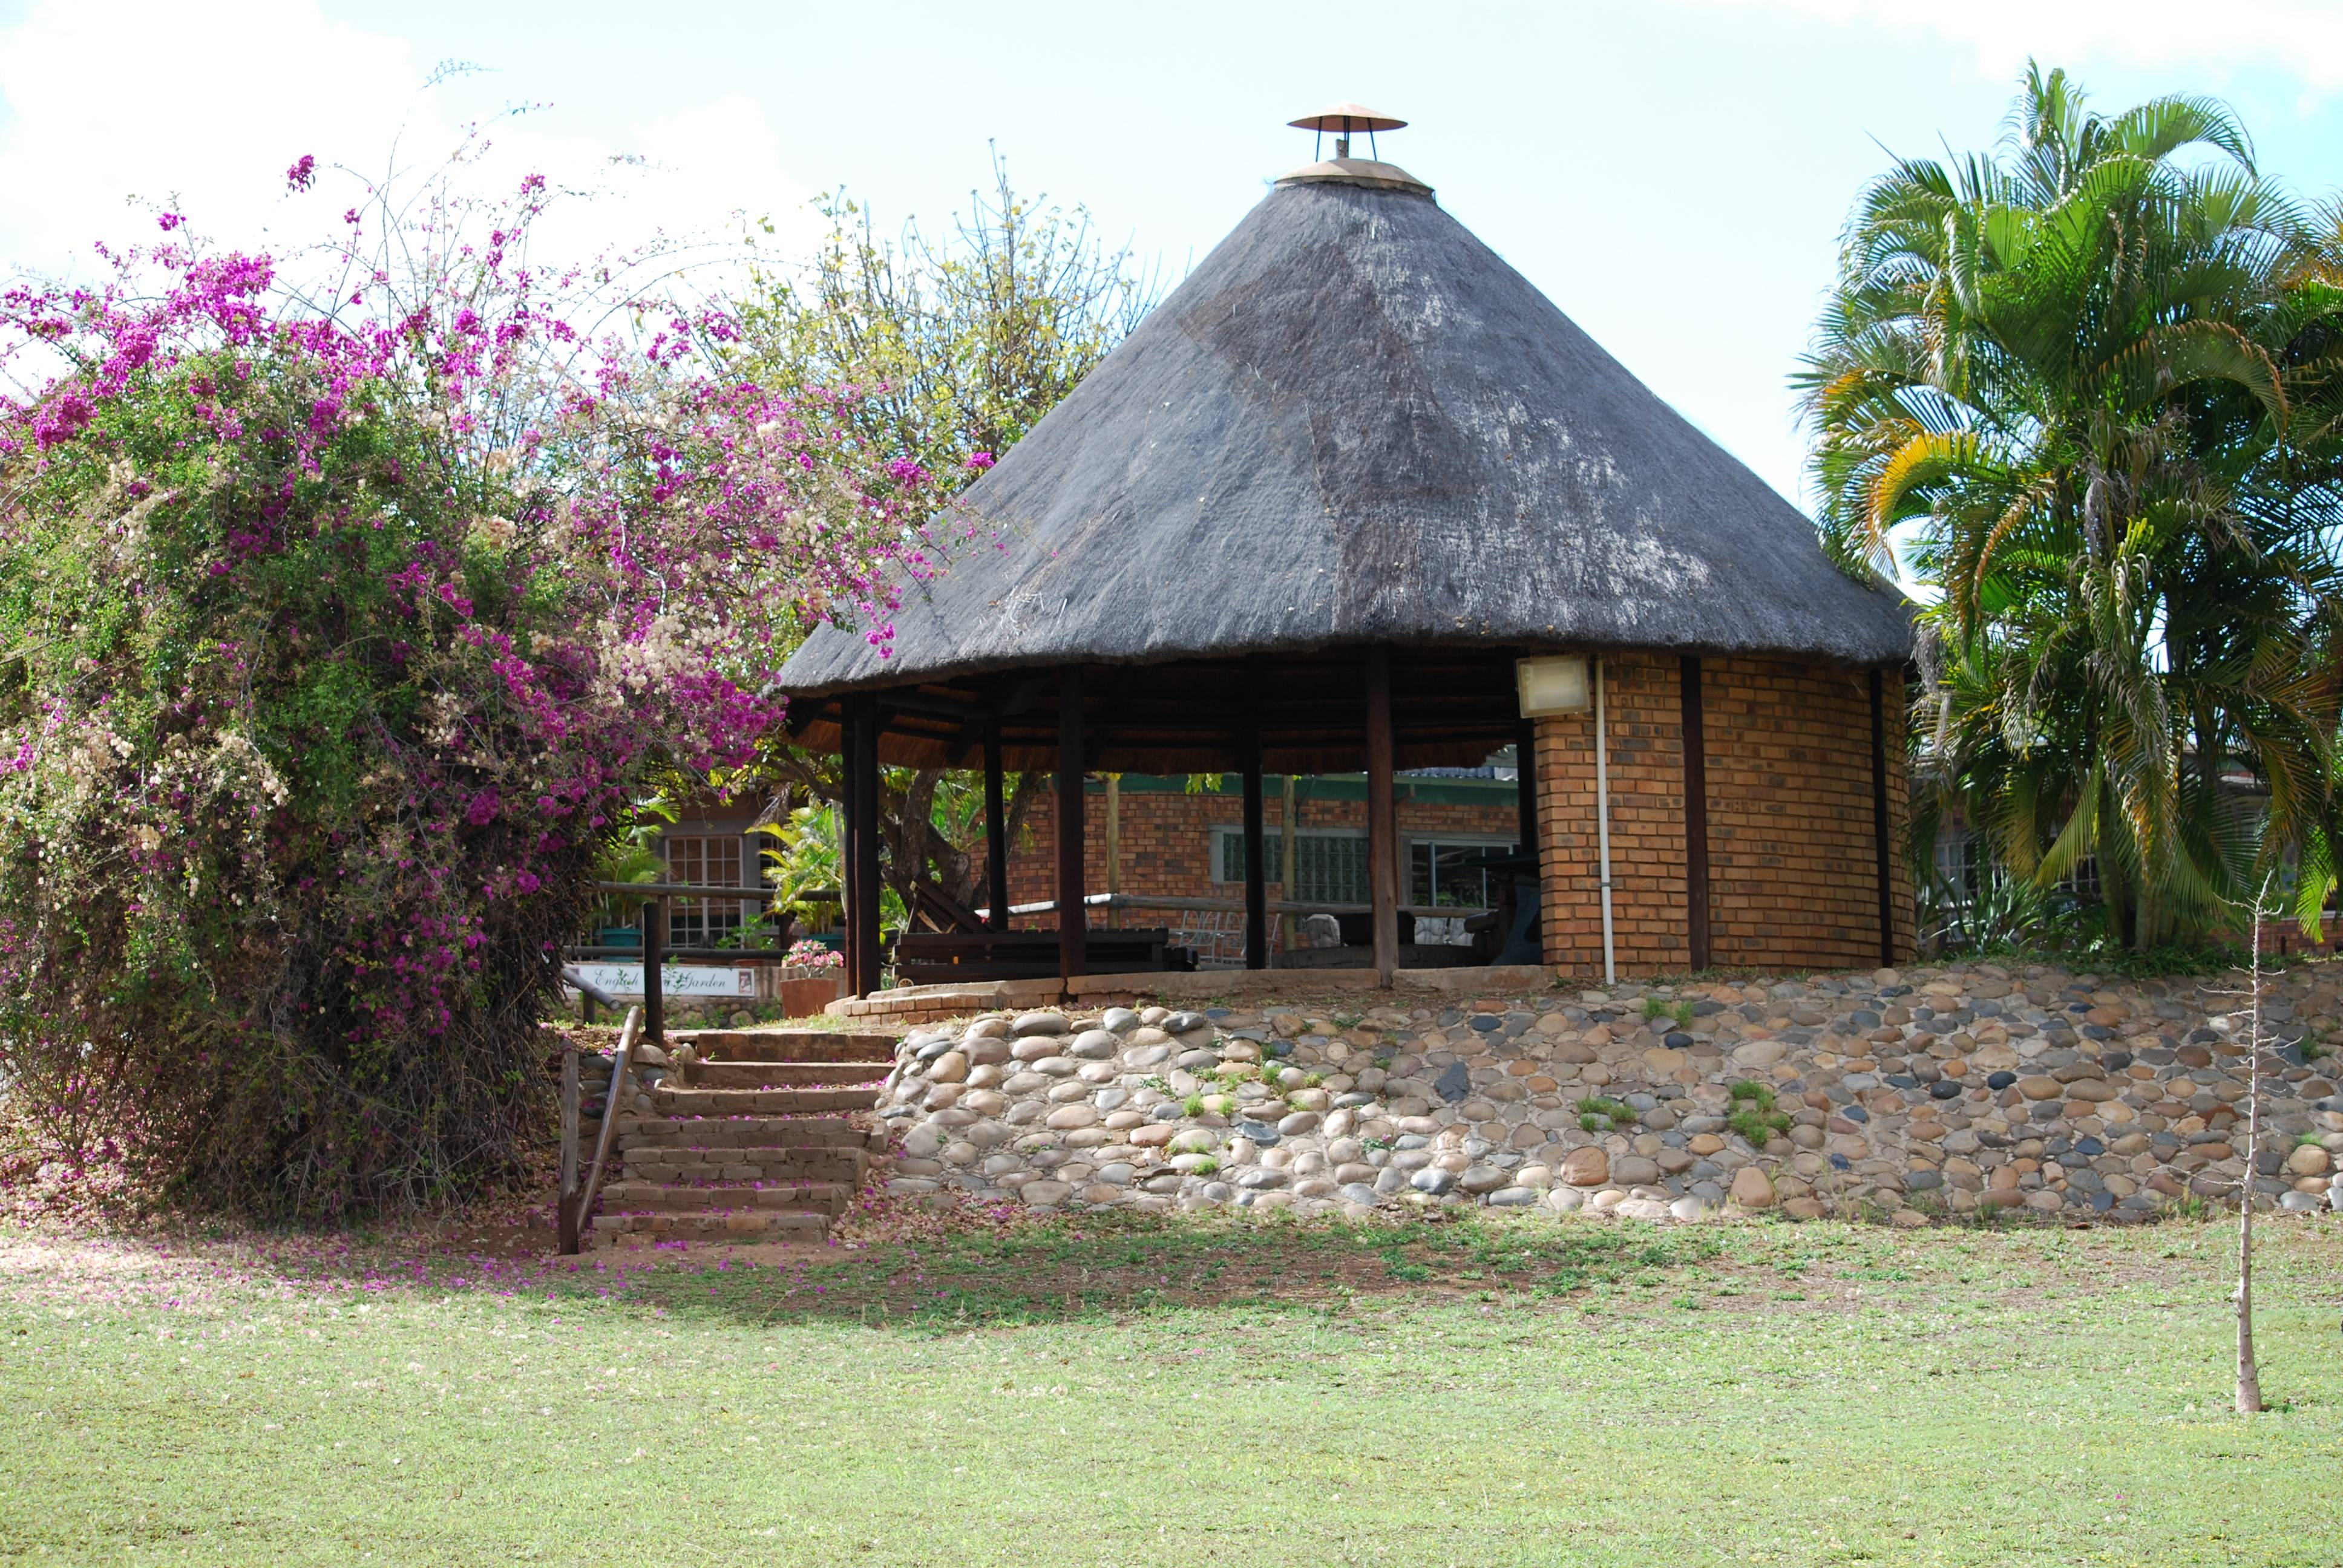 Photo 1: The hippo pool resort, une petit coin de paradis !